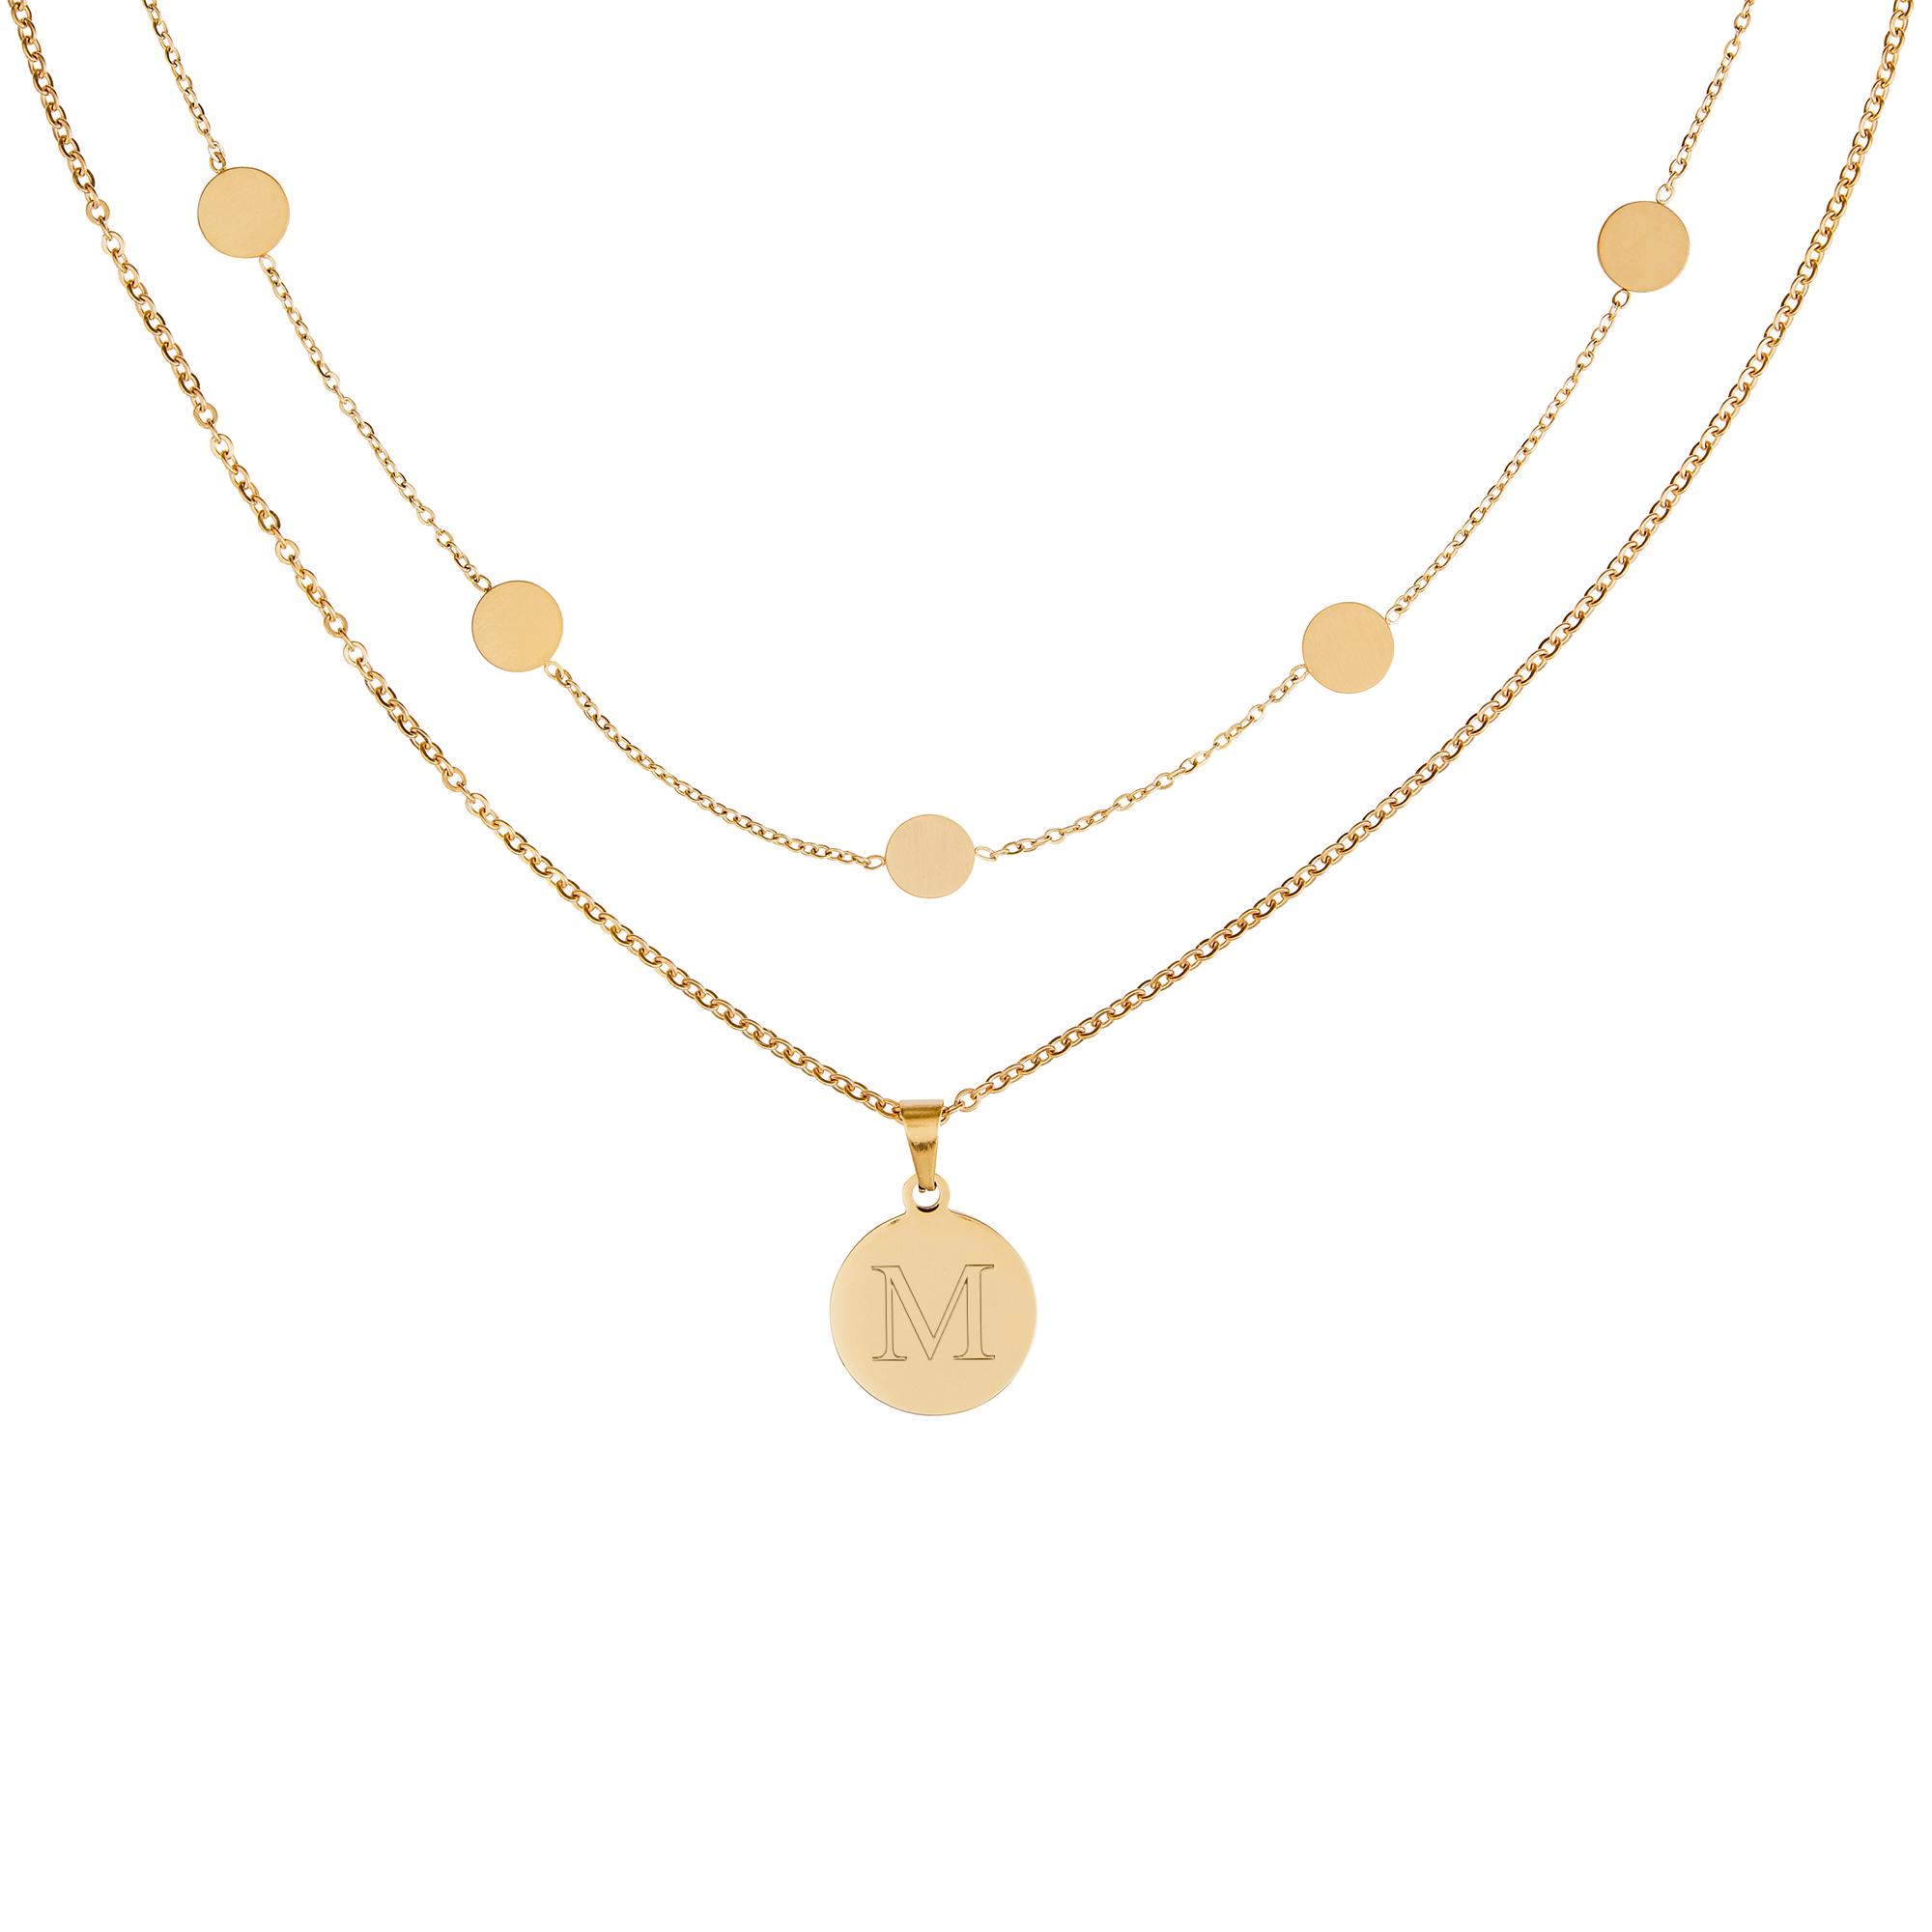 Bundle - Layering Kette - Kette Kreis S - Gold - Initial - Personalisiert